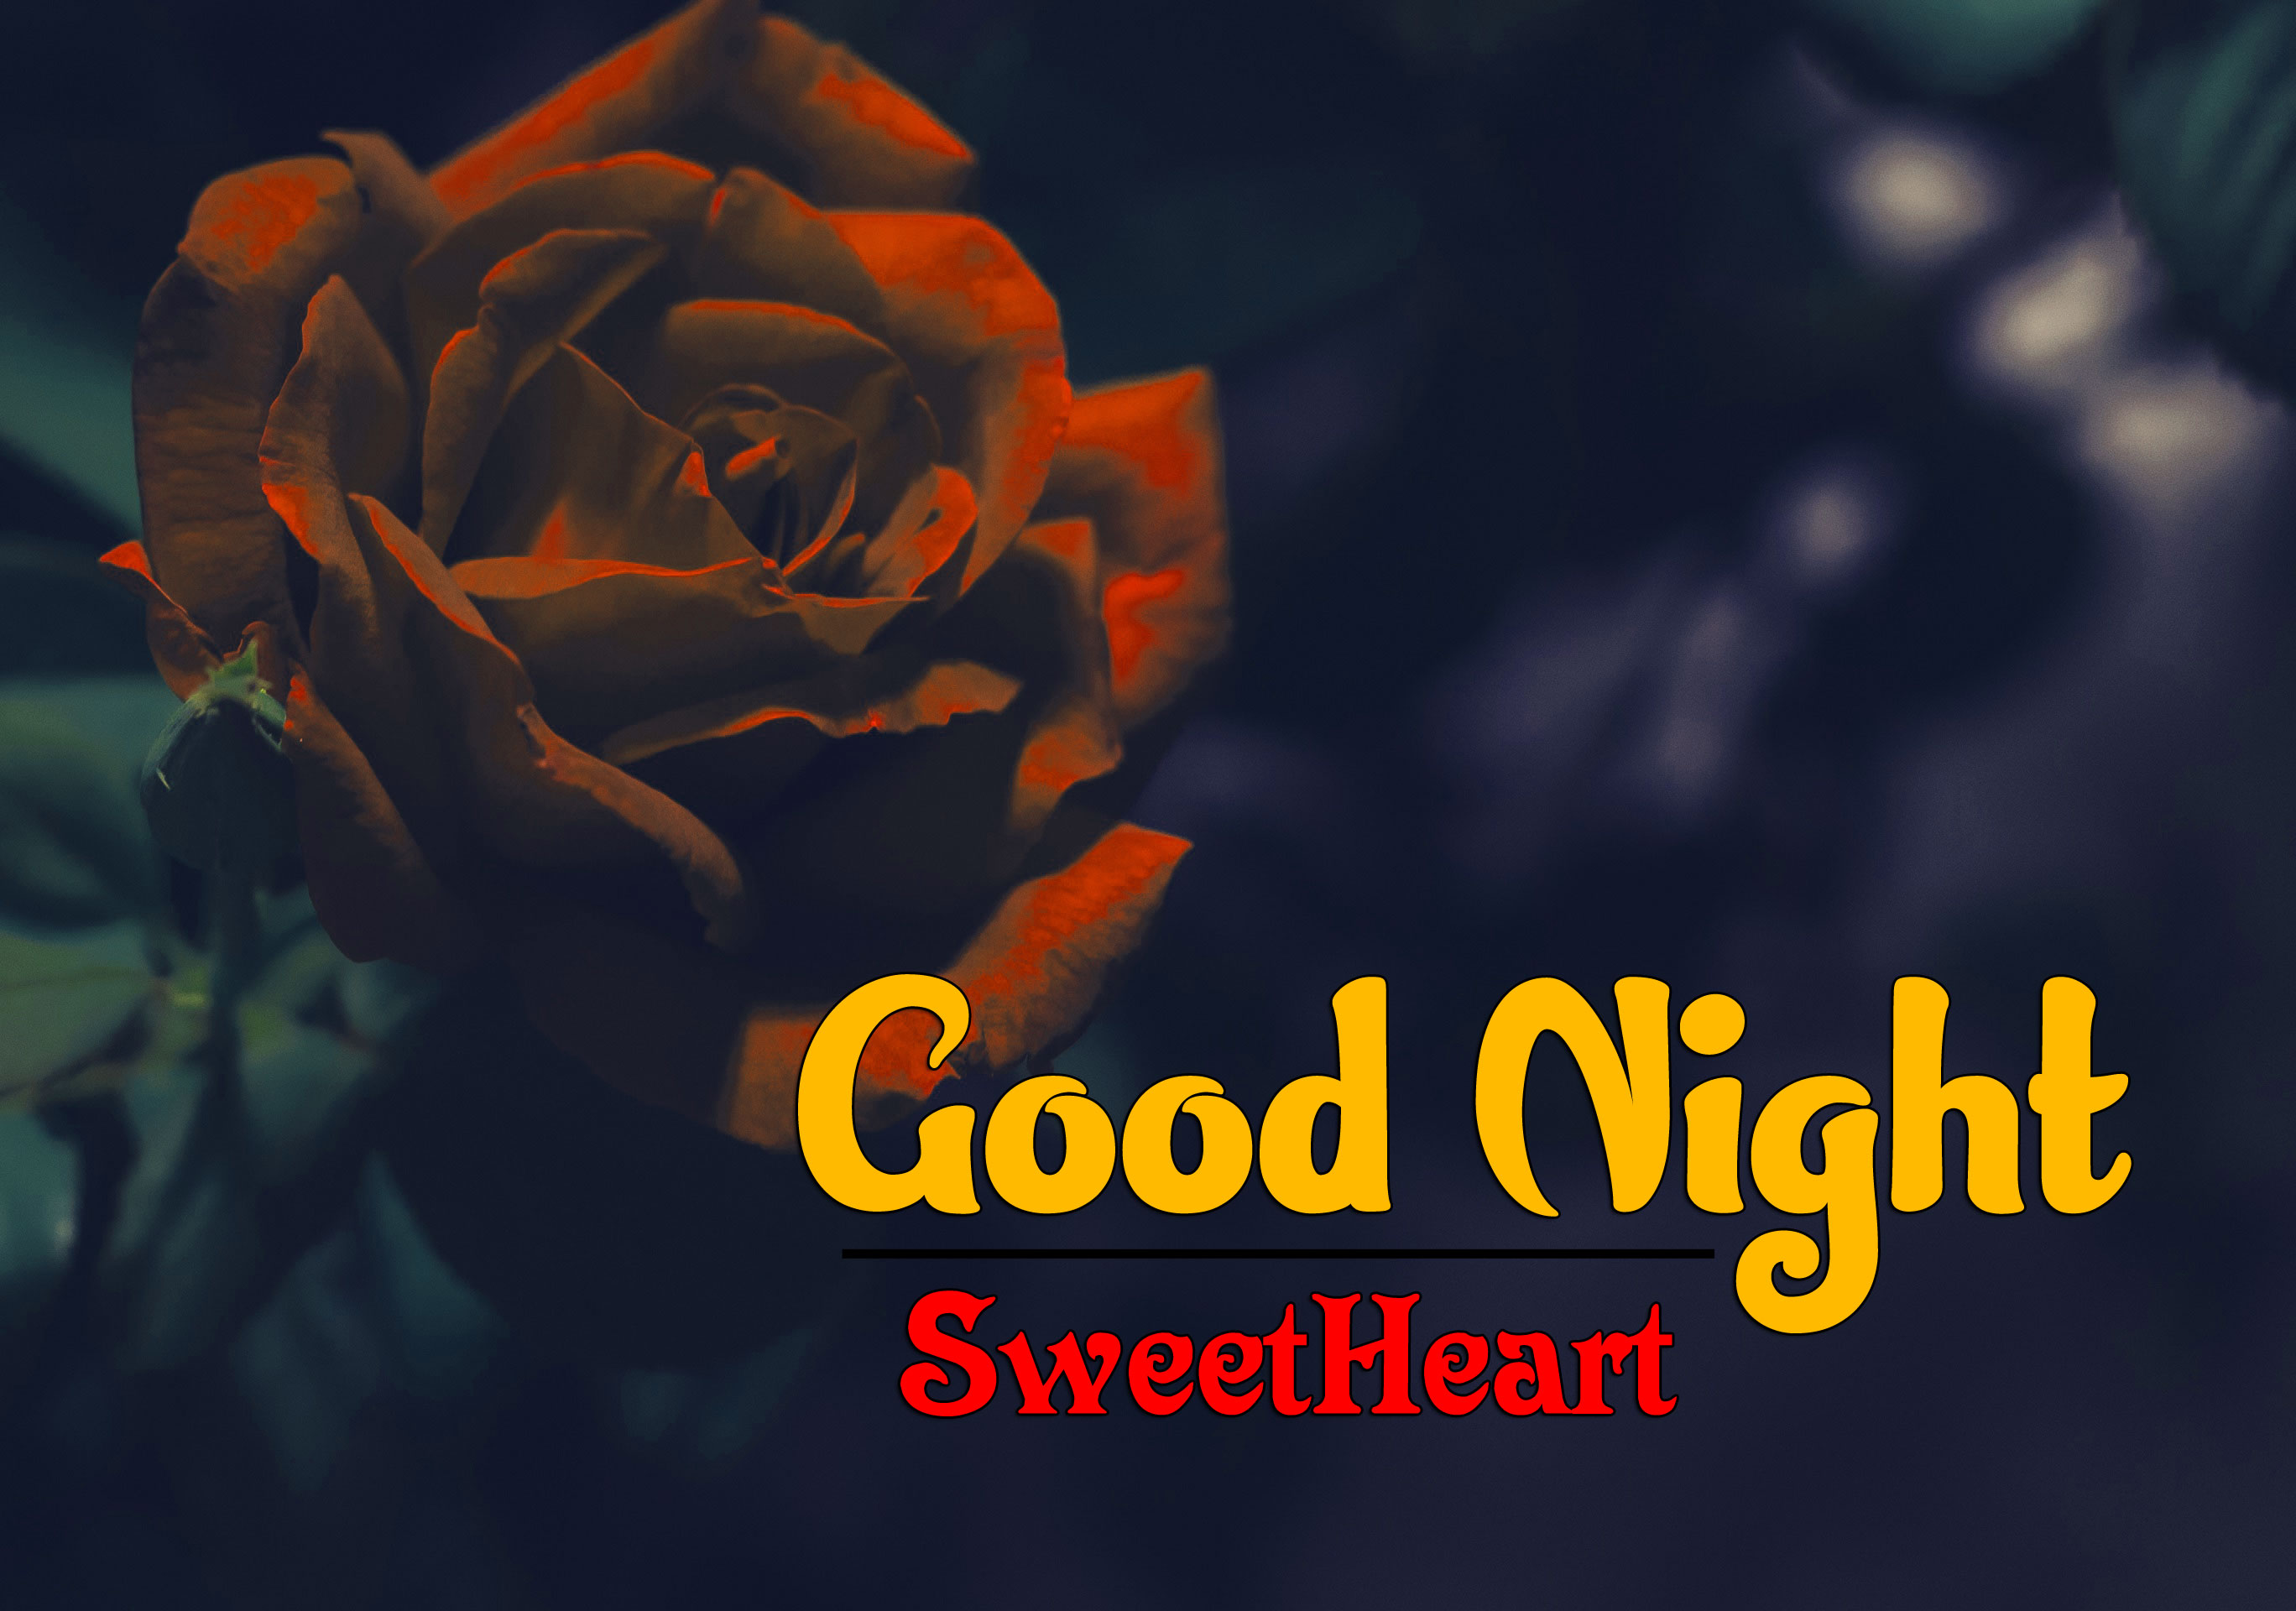 Good Night Download Images Free